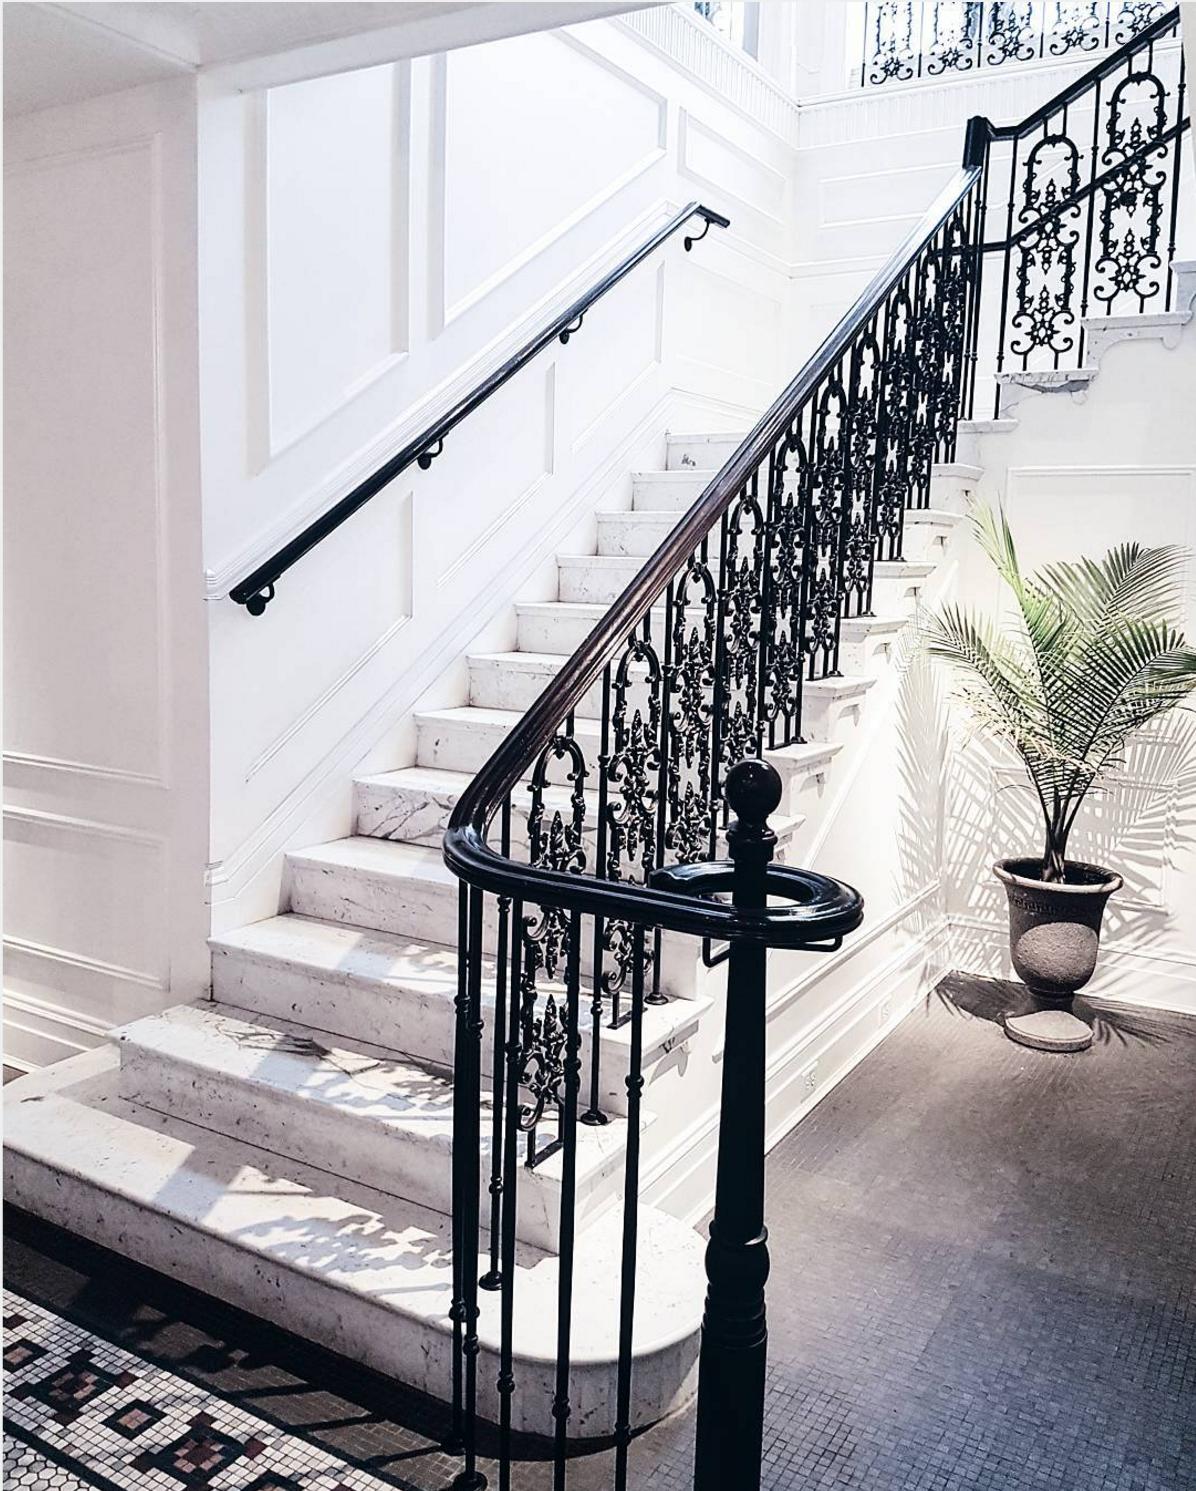 101 planos de casas dise os de una escalera con estilo for Escalera de hormigon con descanso